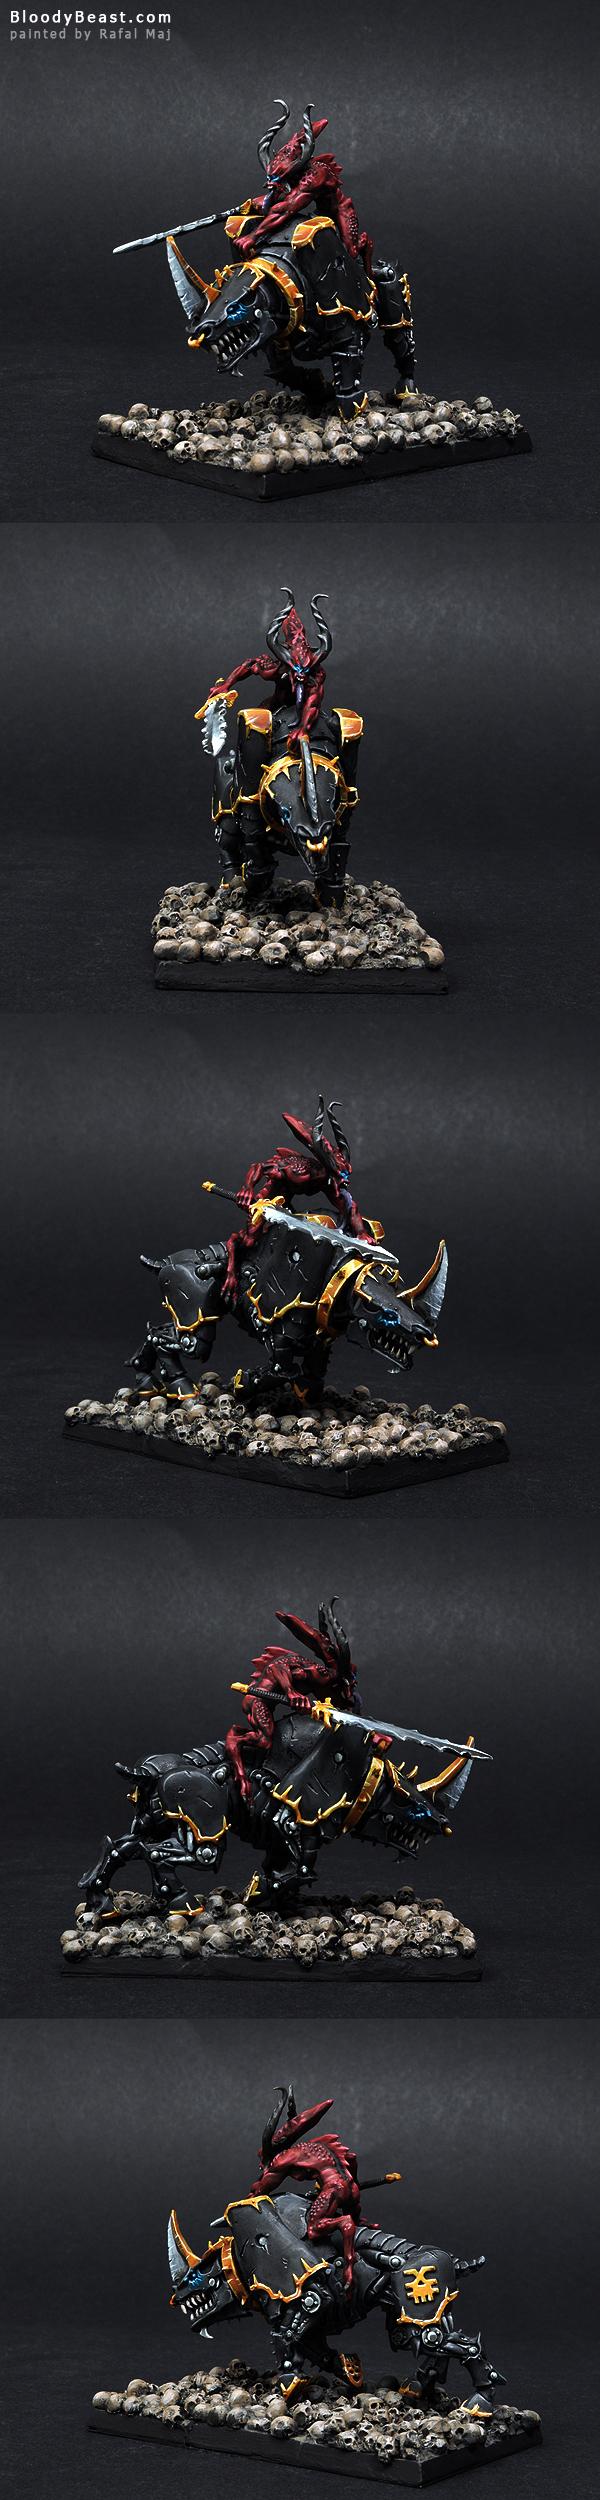 Bloodcrusher of Khorne painted by Rafal Maj (BloodyBeast.com)